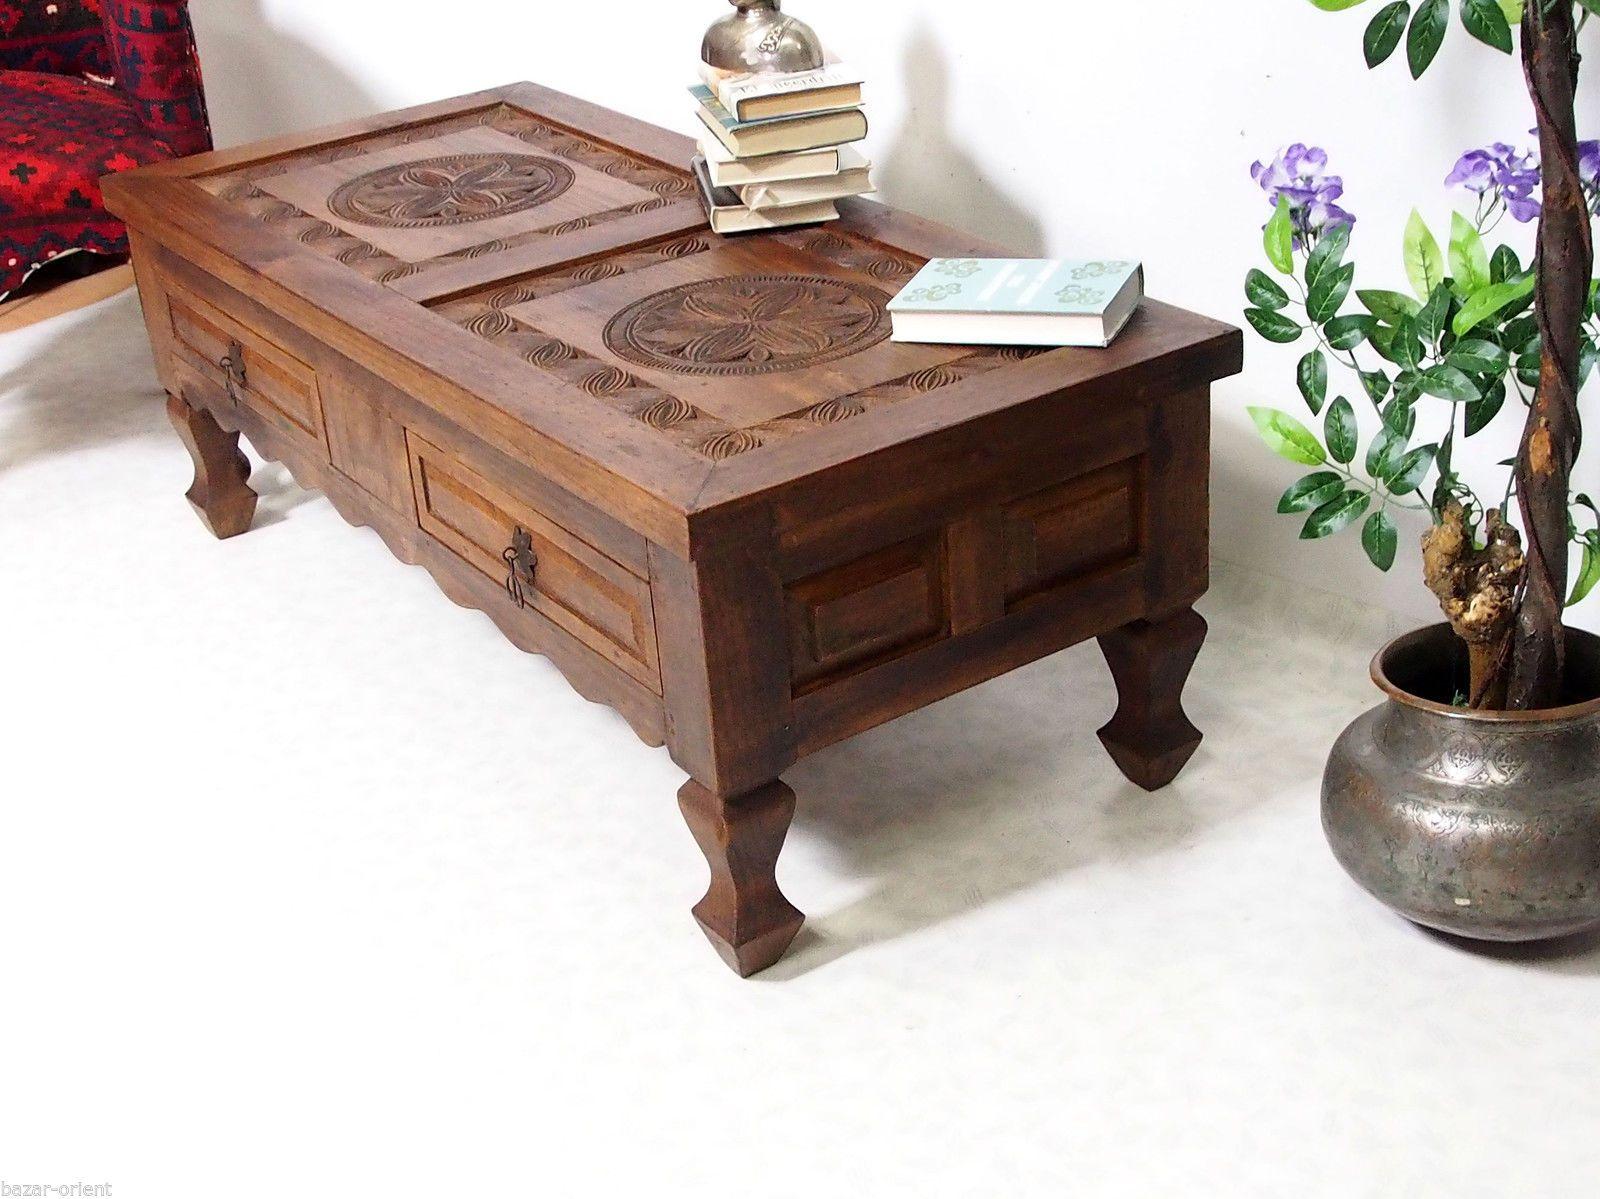 128x56cm Antik Kolonial Wohnzimmertisch Tischtruhe Tisch